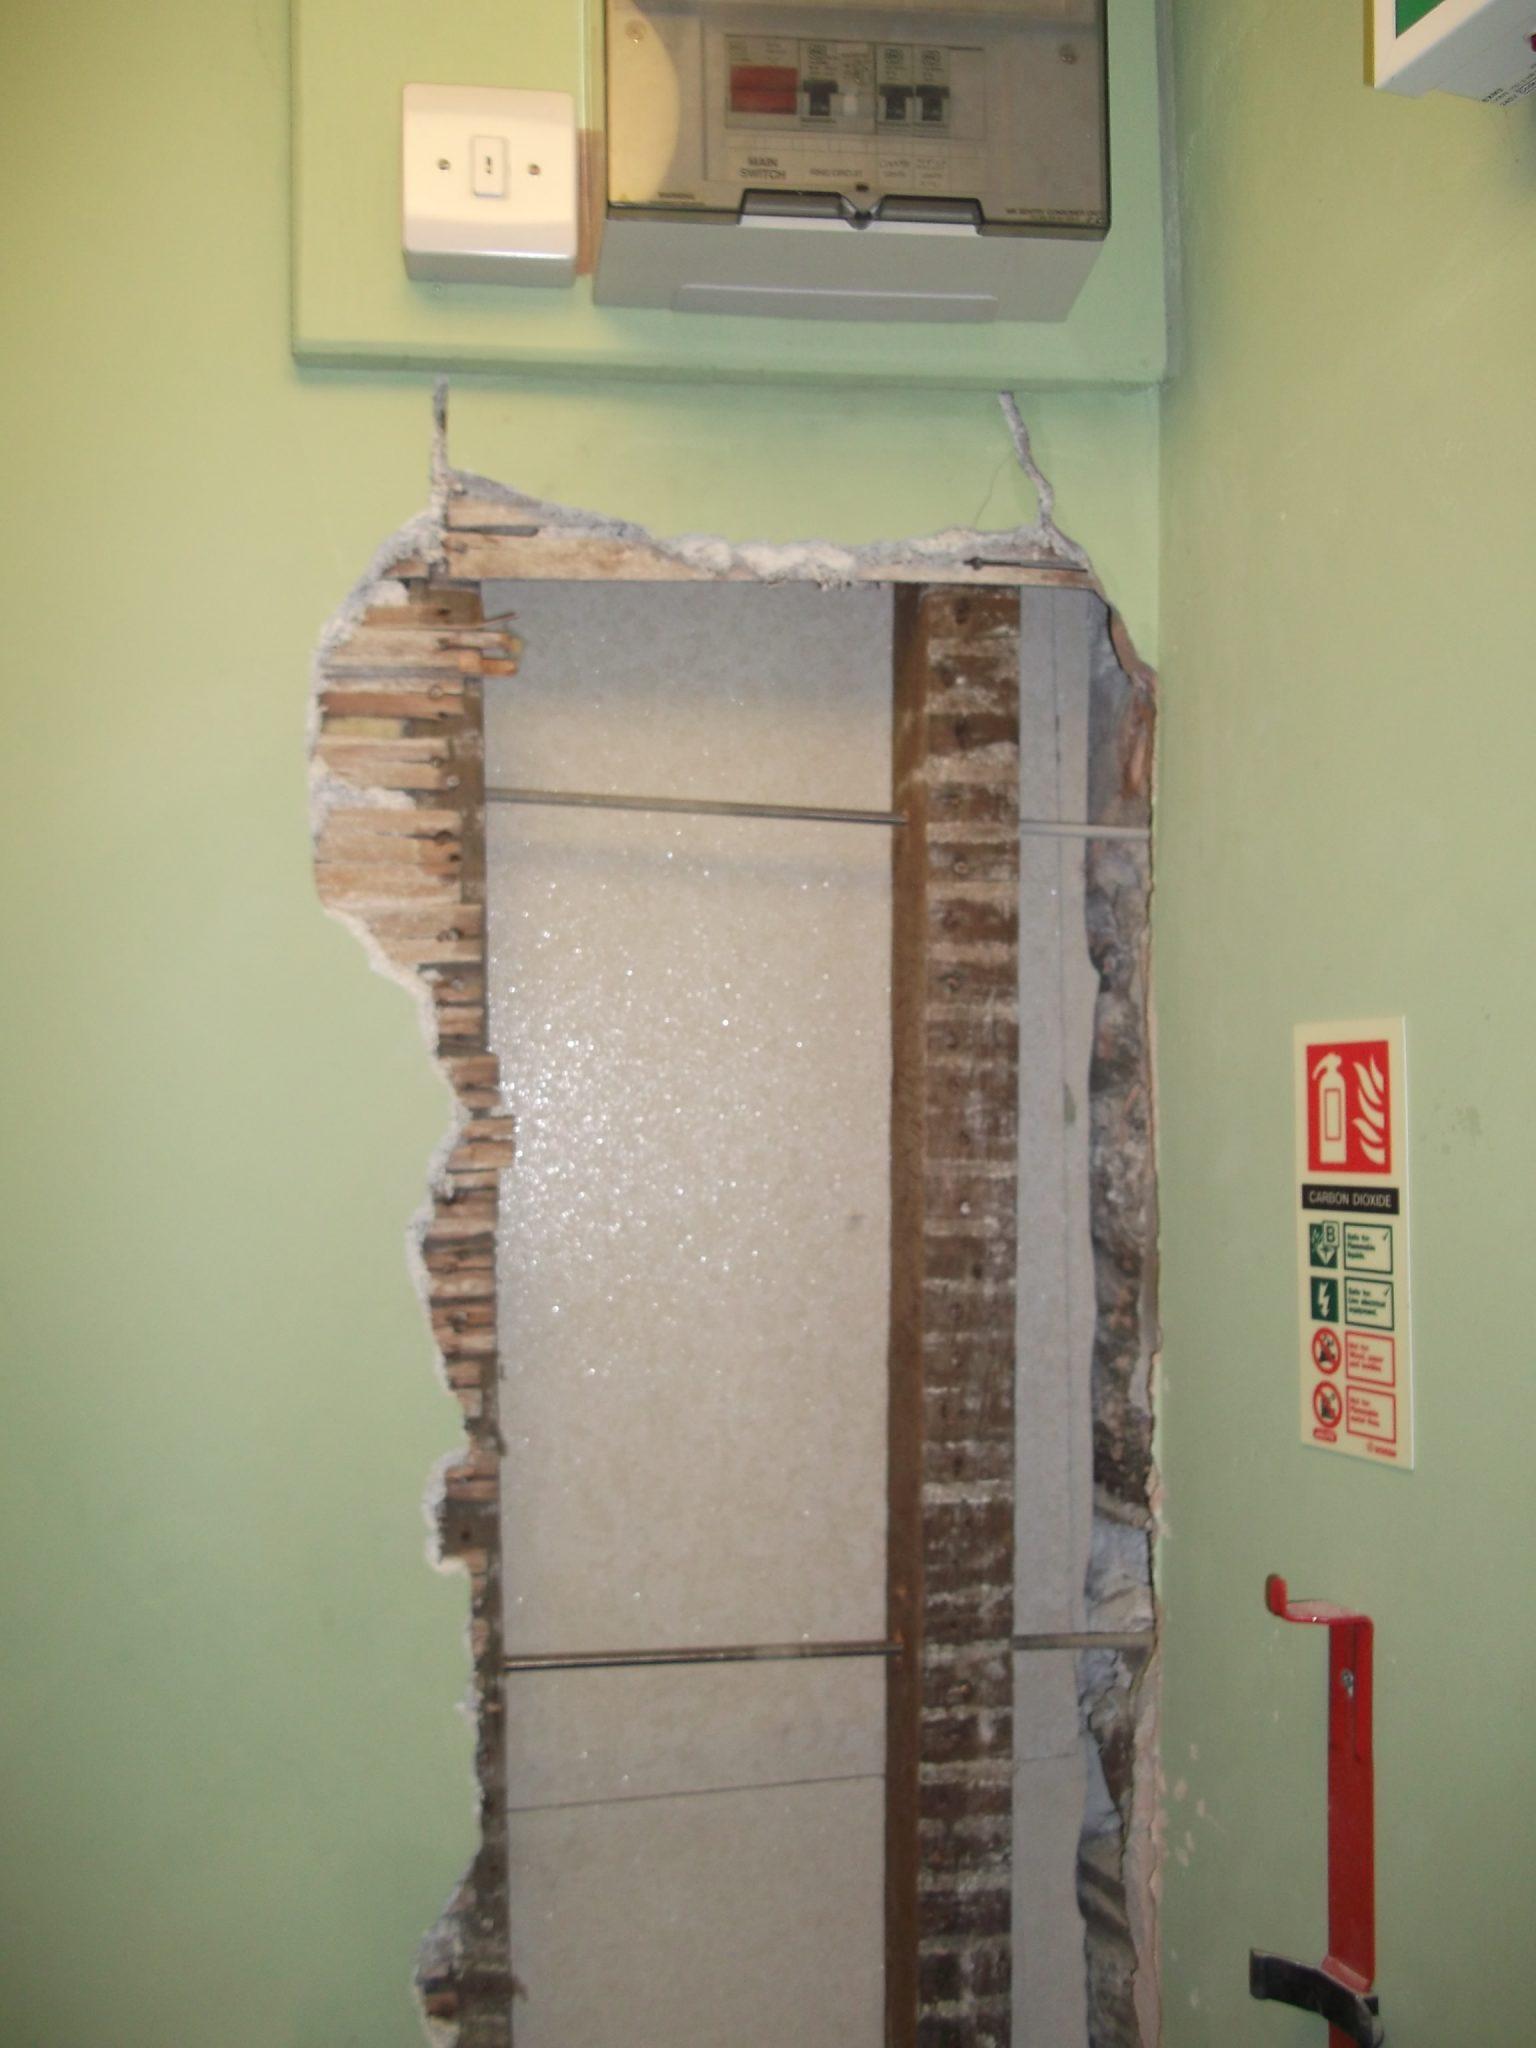 Repairs underway